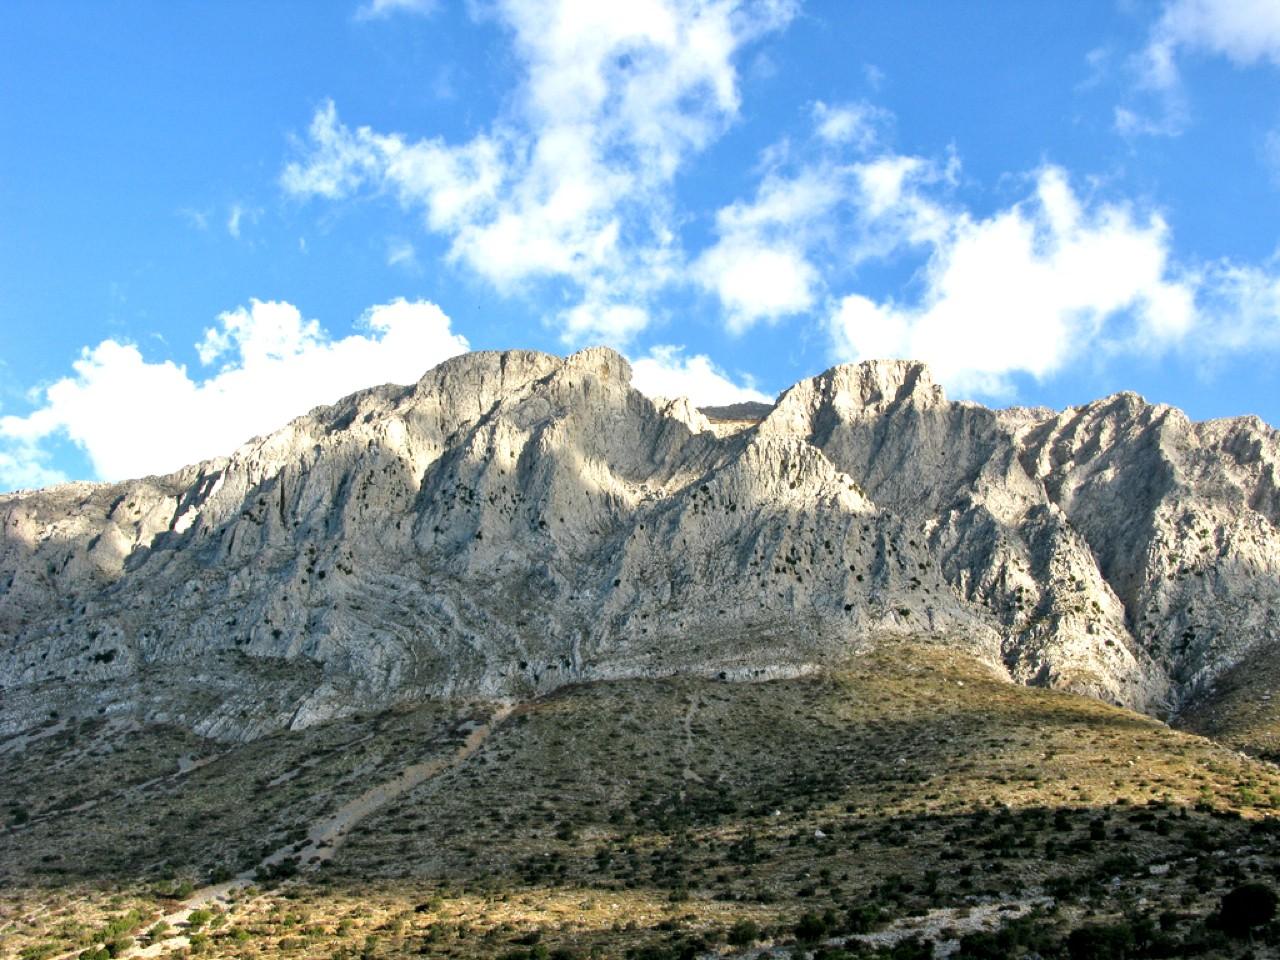 Spathi Hiking Day Trip, spathi east crete hiking trip, best hiking trip crete, spati hiking tour, spathi dikti mountain hiking trekking tour, activities east crete, activity east crete, lasithi region best activities